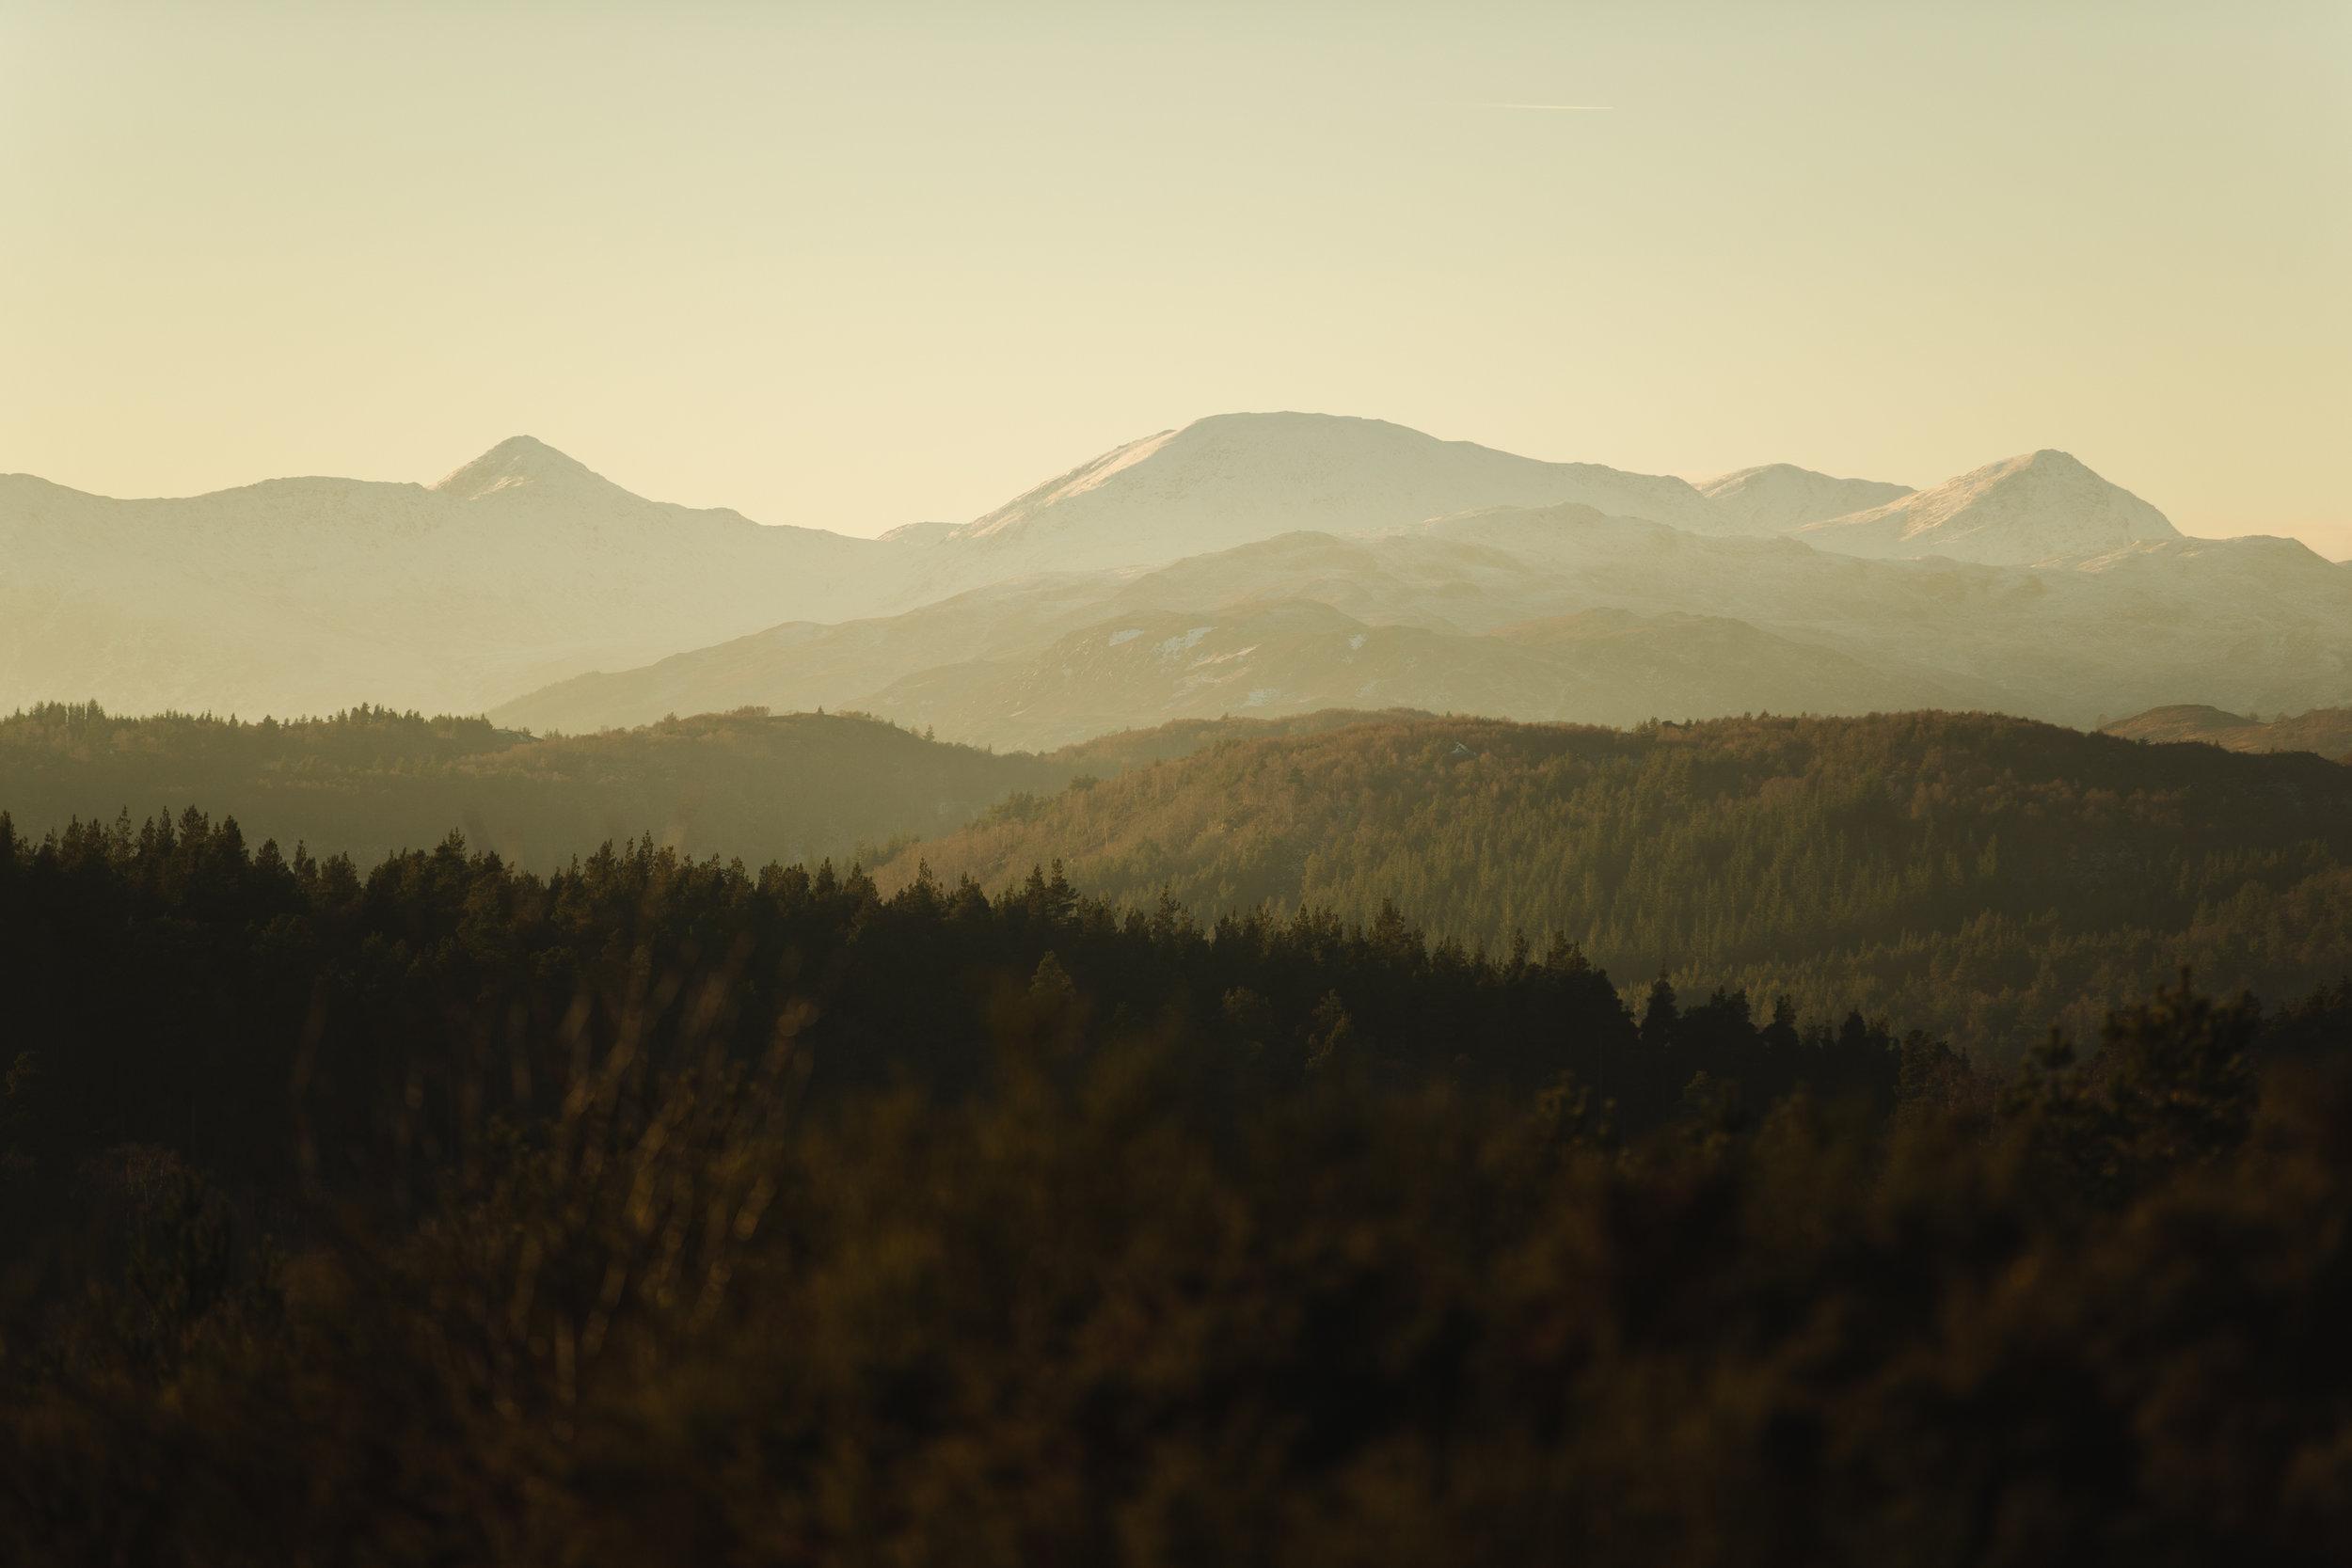 Mount-57-2.jpg